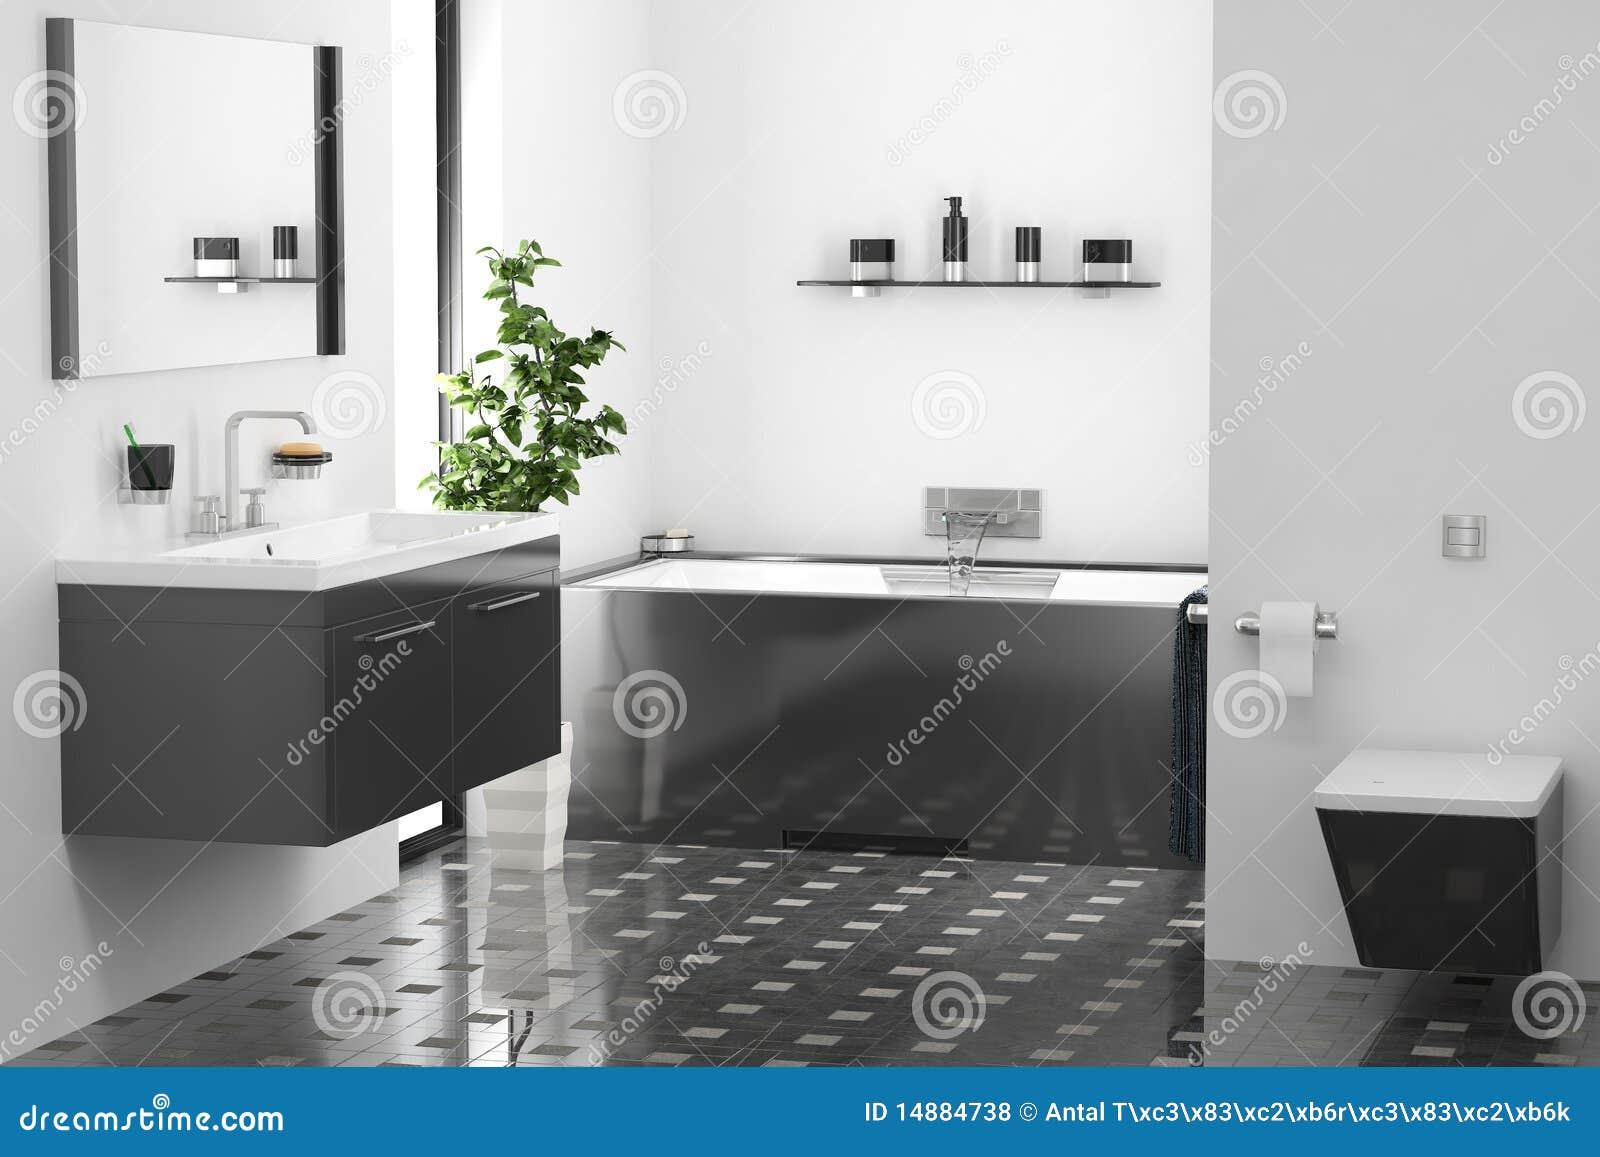 Moderne badkamers stock illustratie afbeelding bestaande uit vloer 14884738 - Moderne badkamer betegelde vloer ...